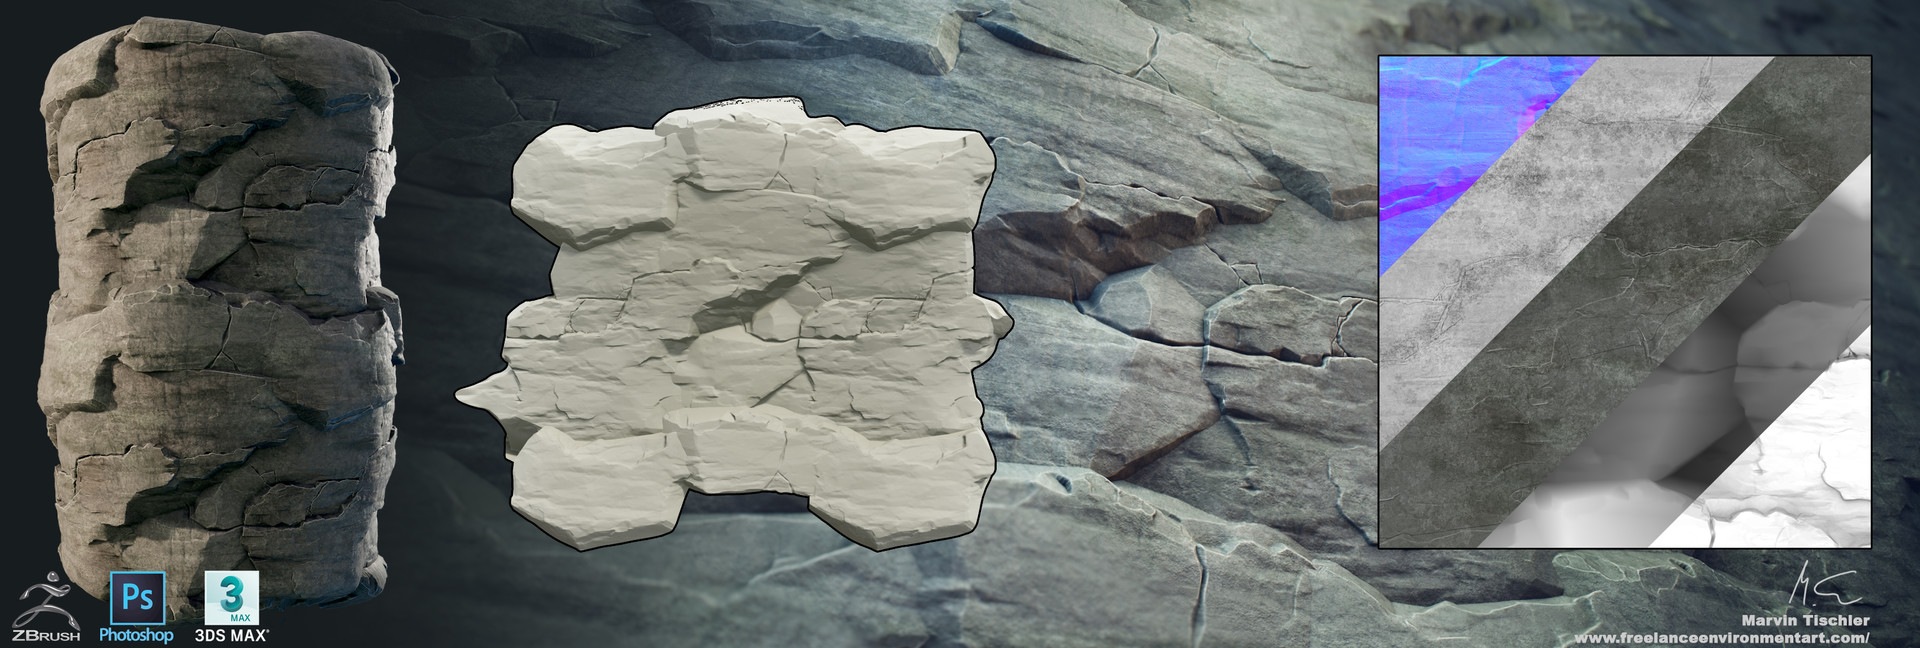 Marvin tischler textures 002 c